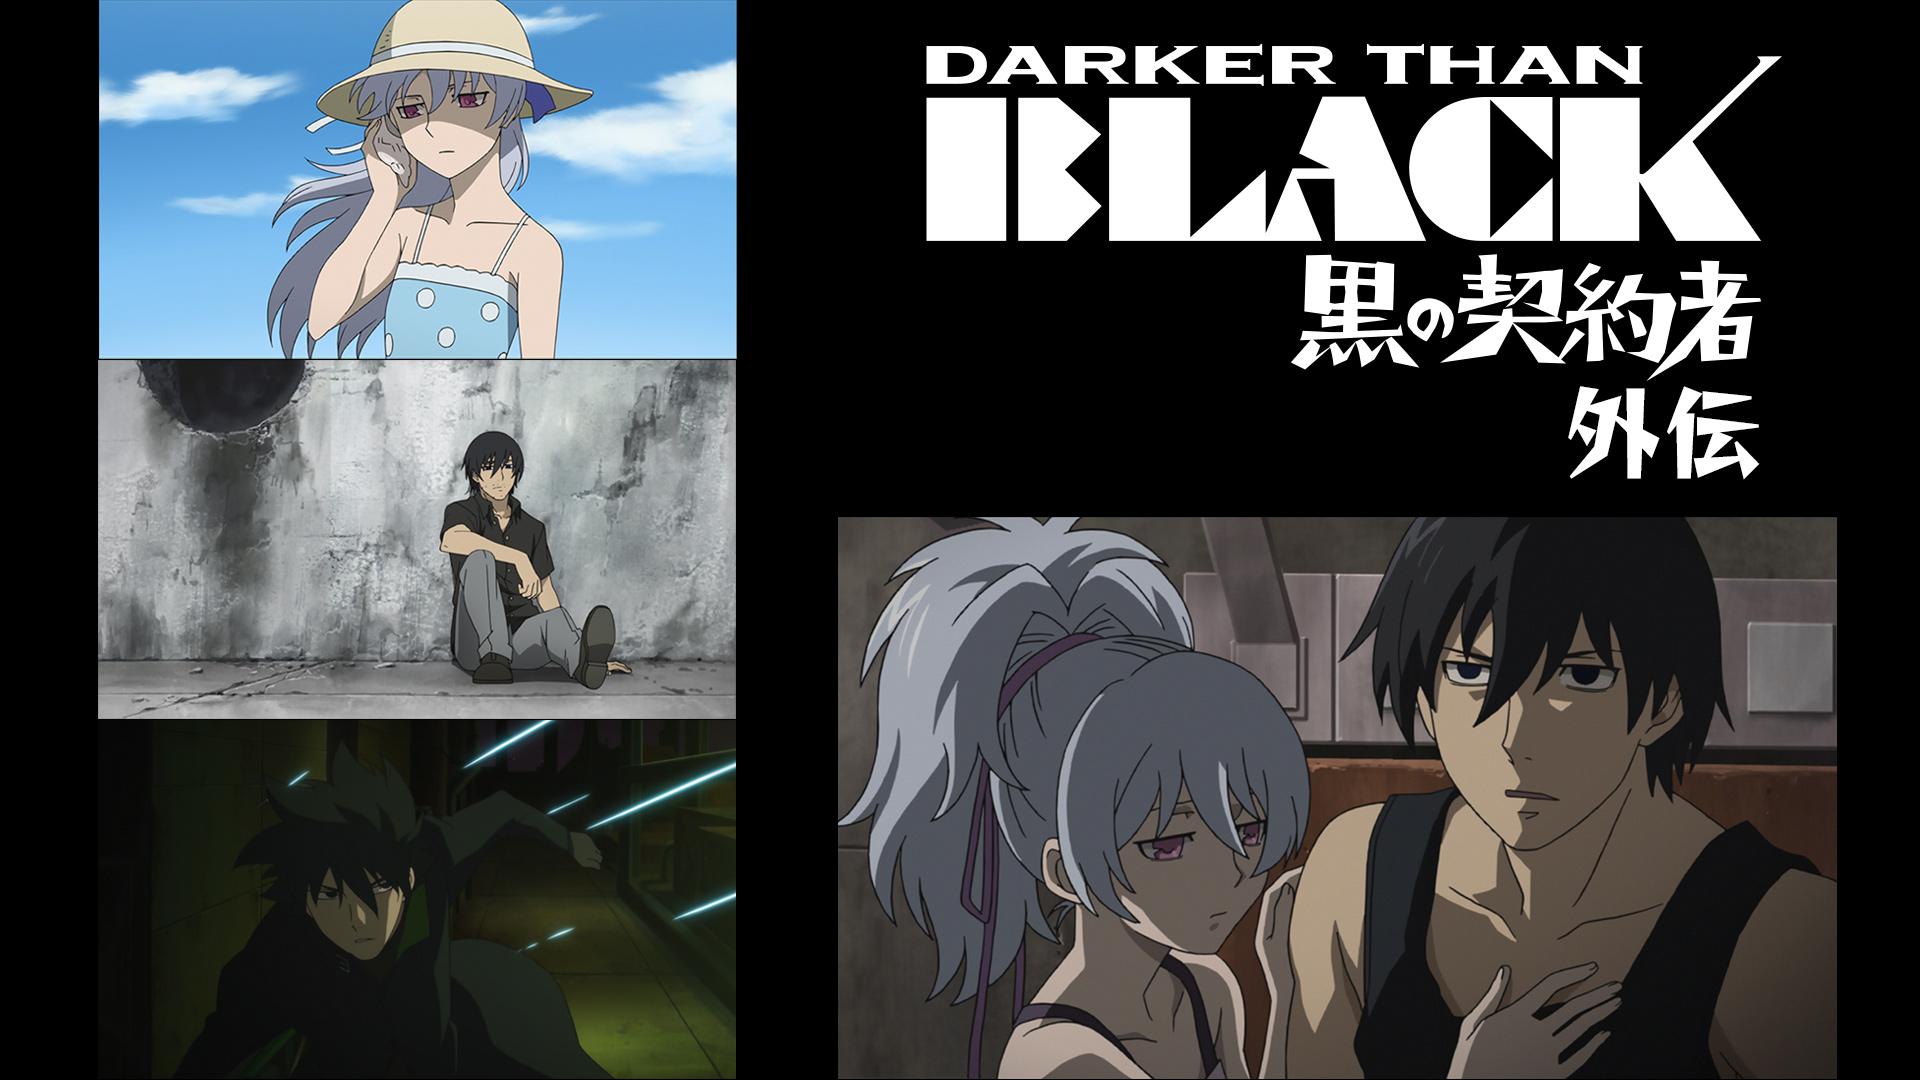 DARKER THAN BLACK-黒の契約者- 外伝